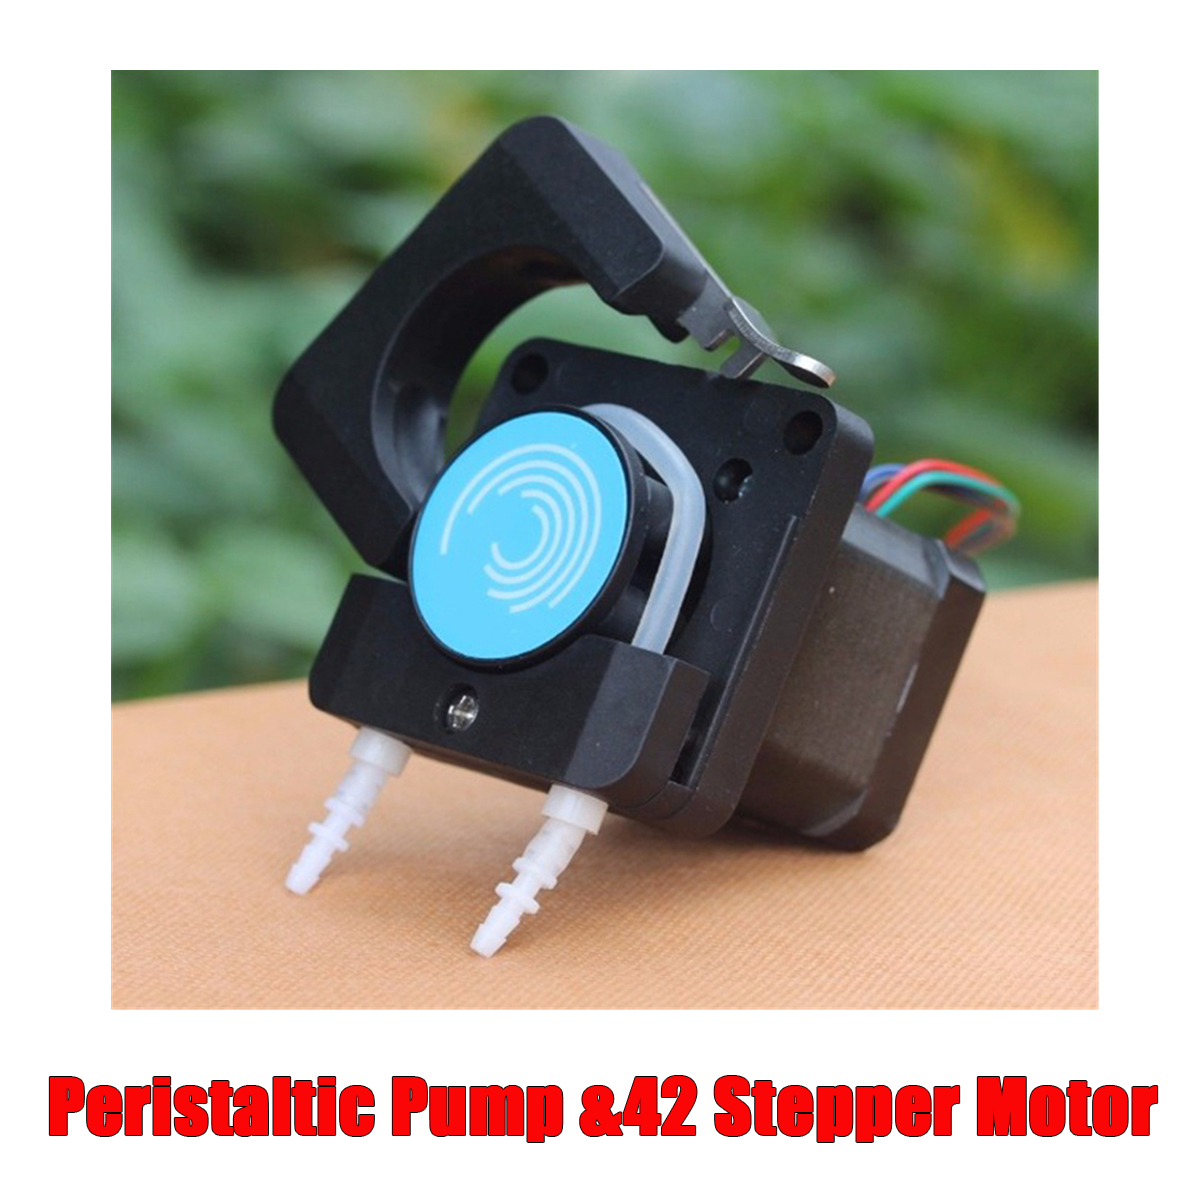 DC 12V 24V Peristaltic Pump Dosing Pump + 42 Stepper Motor Tubing Hose Diaphragm Pump Vacuum Aquarium Lab Analytical Water стоимость